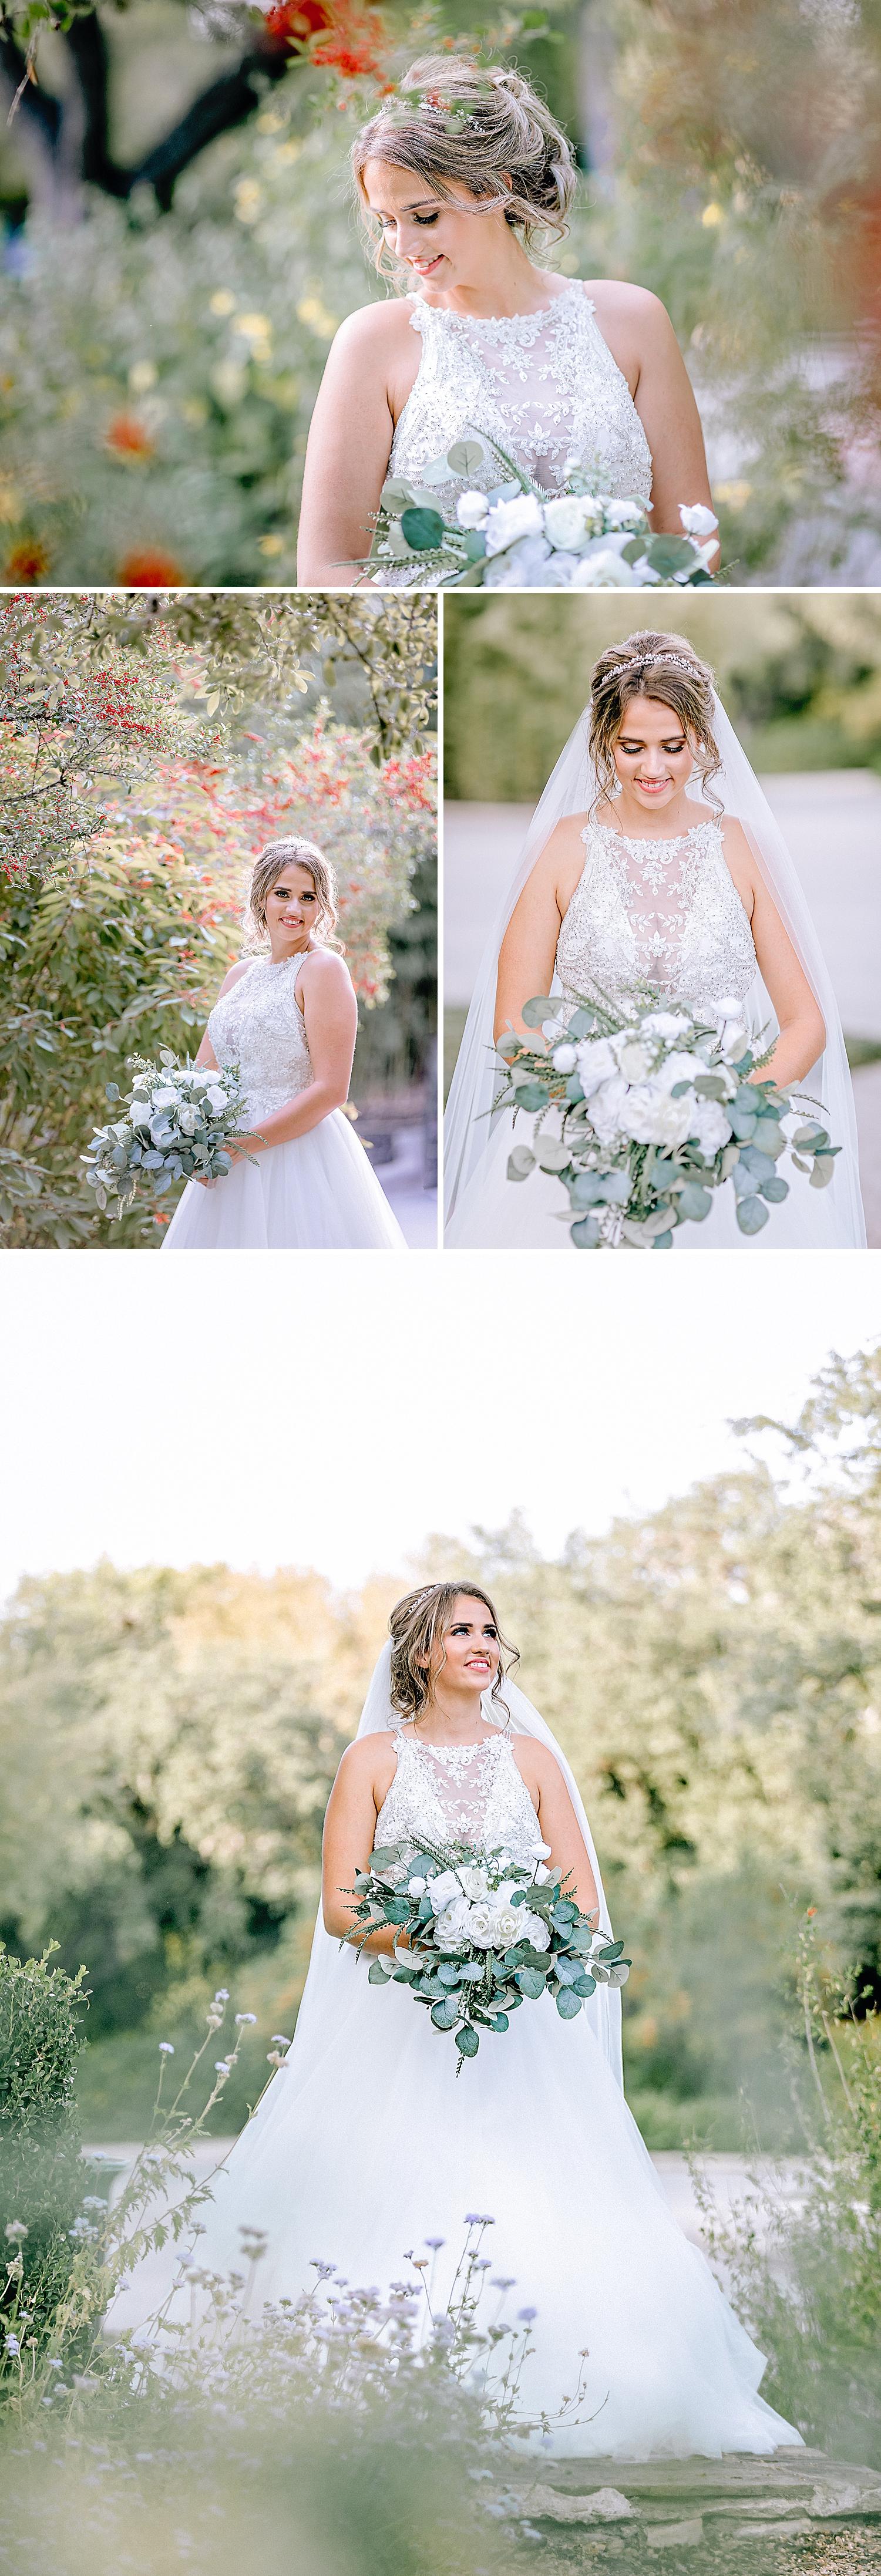 San-Antonio-Weddings-Bridal-Photos-Carly-Barton-Photography_0009.jpg